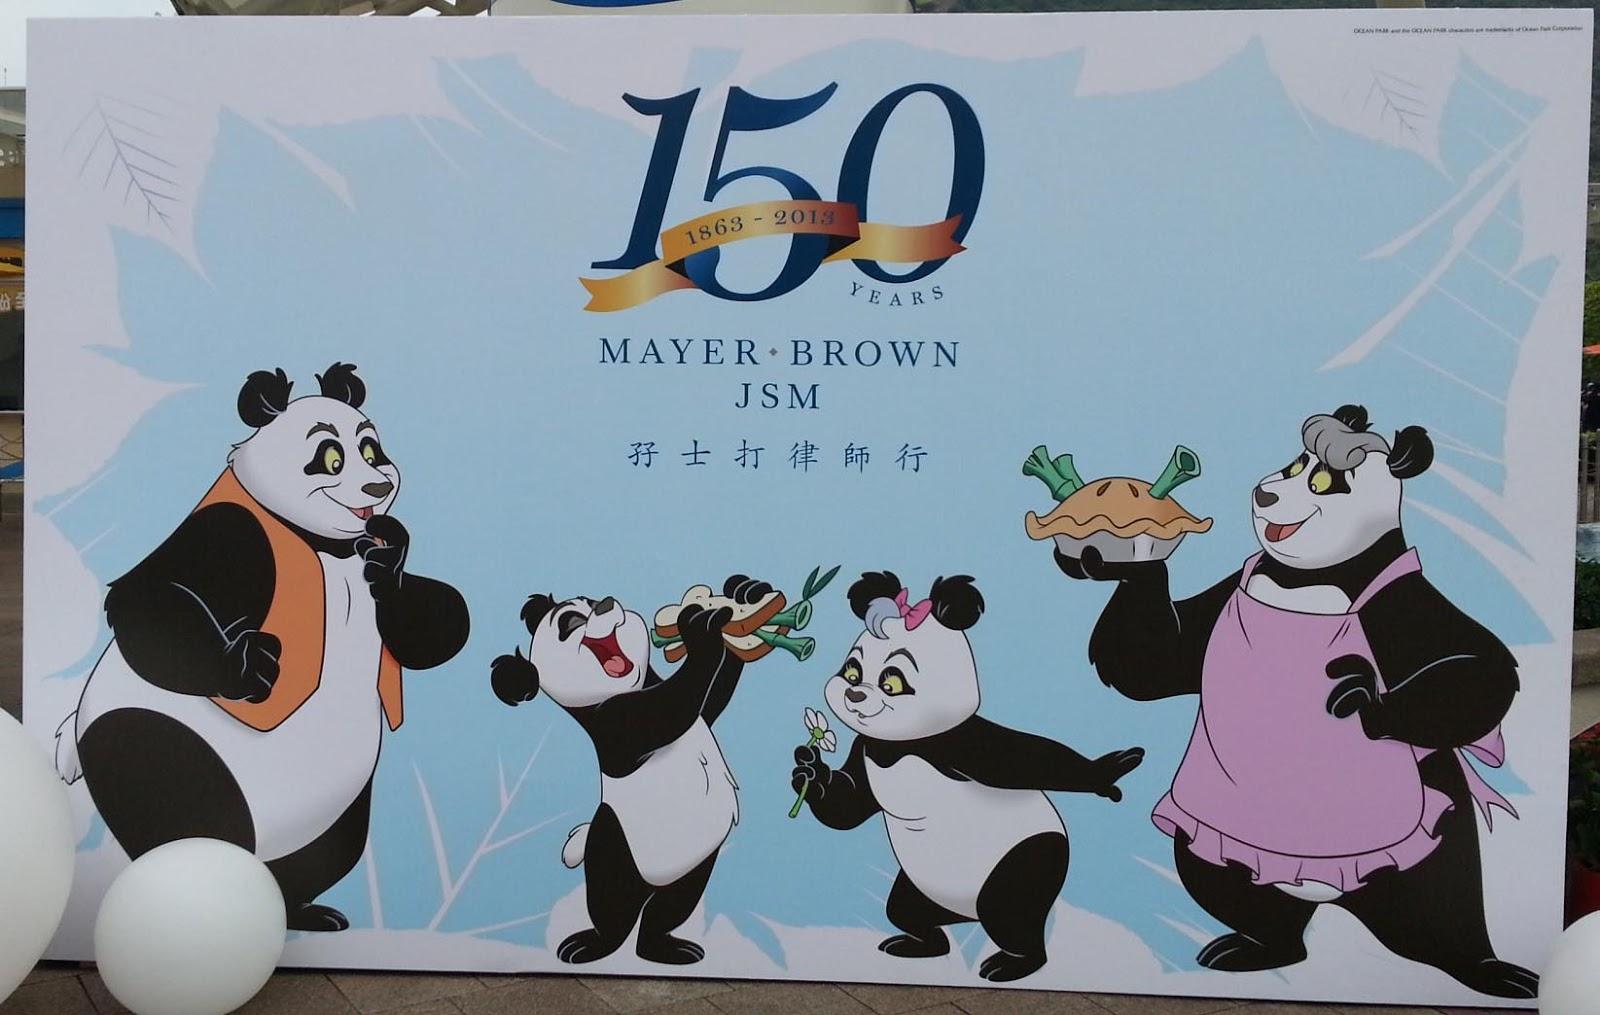 May姨blog: JSM 150th Anniversary